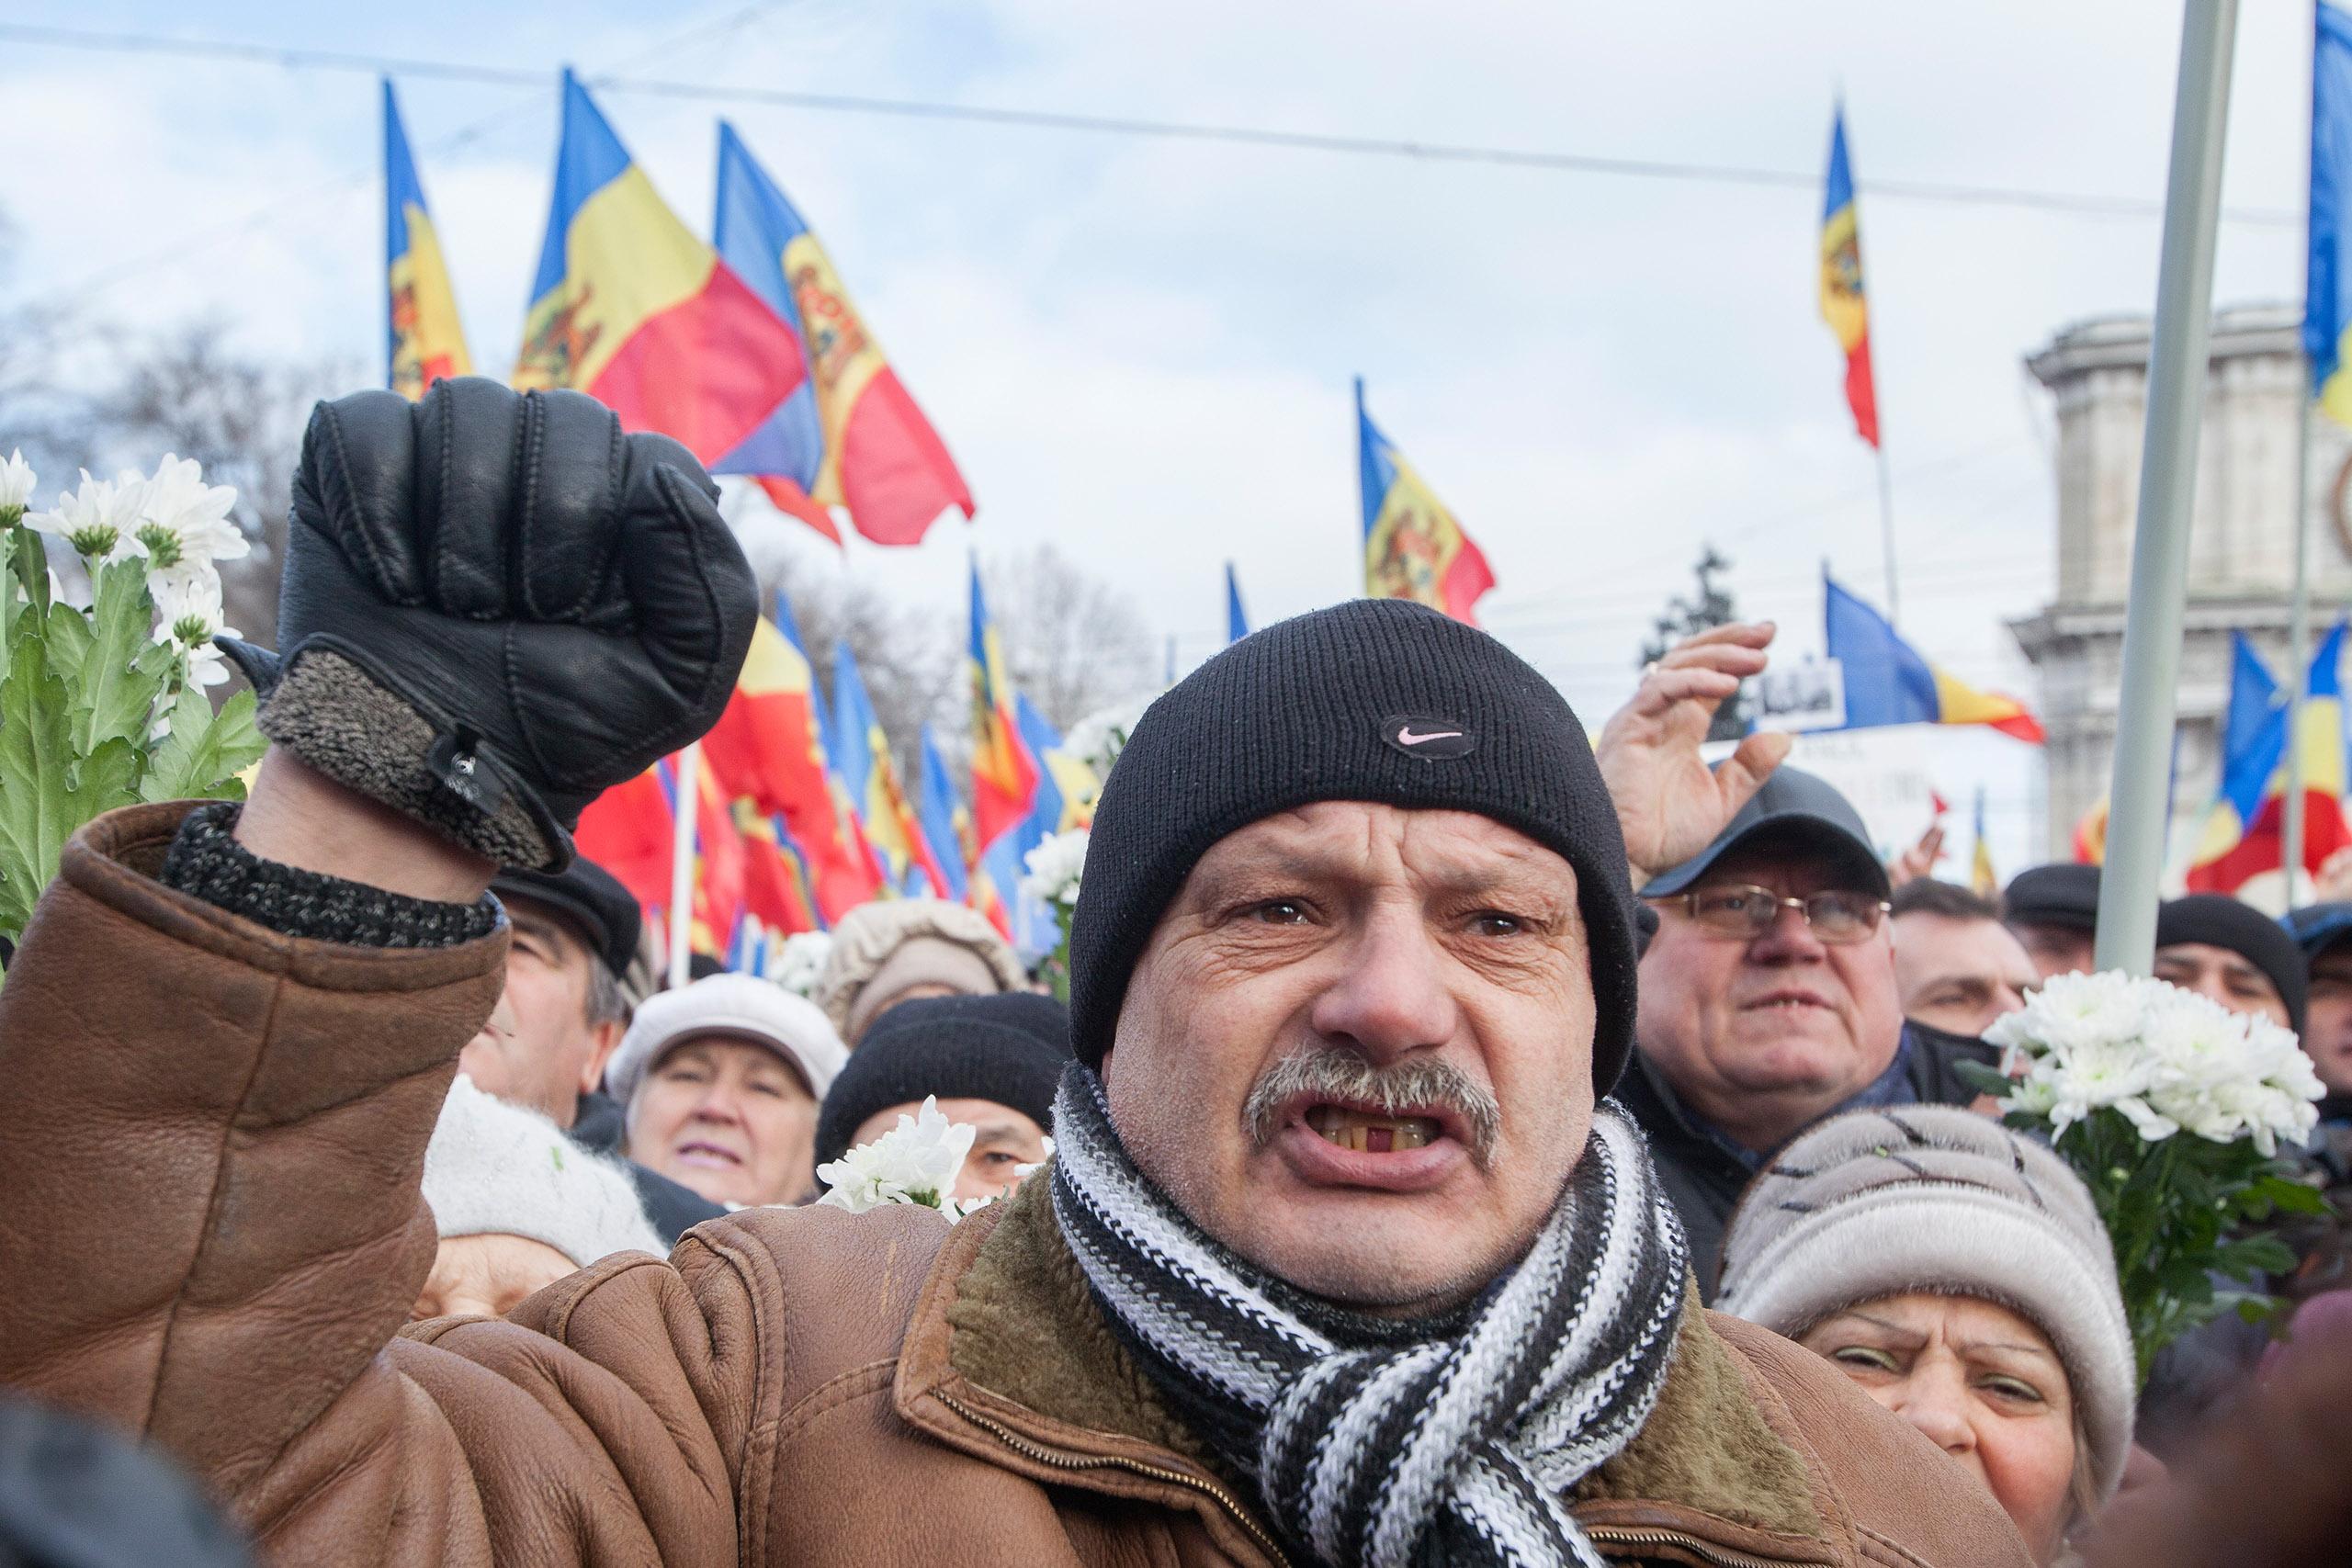 Democrația în Moldova: o poveste de precauție